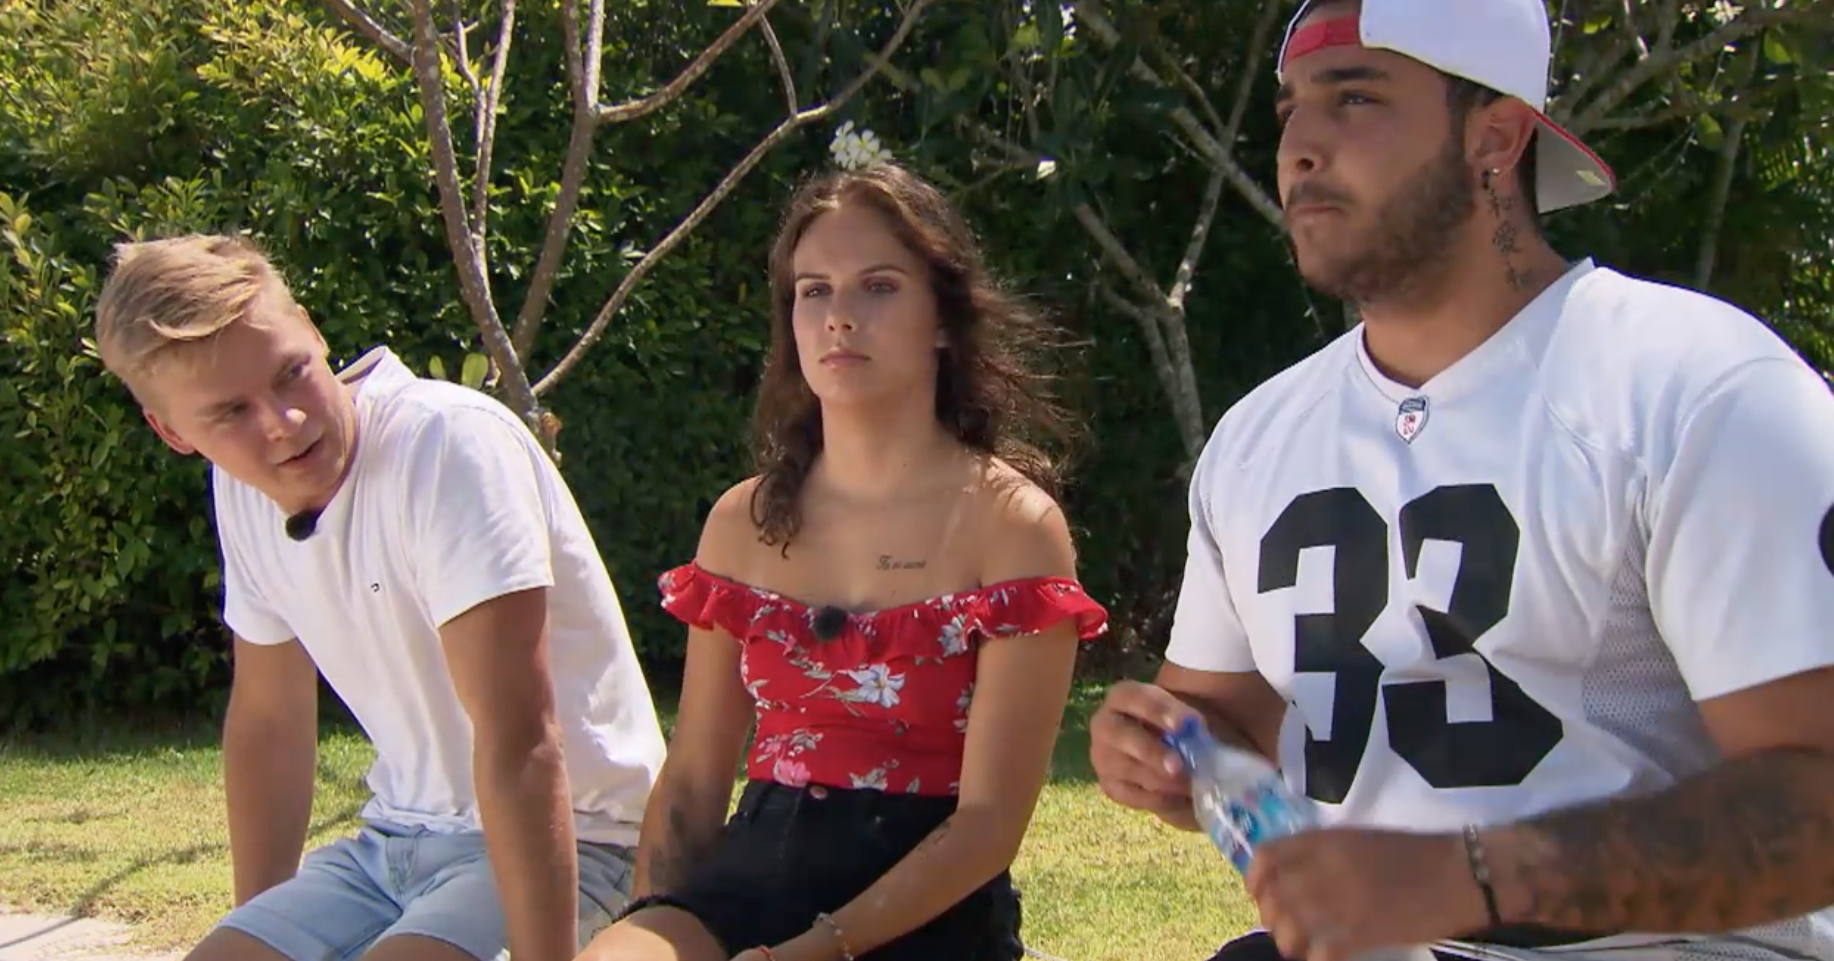 Tis-jeppe, Karim ja Josku